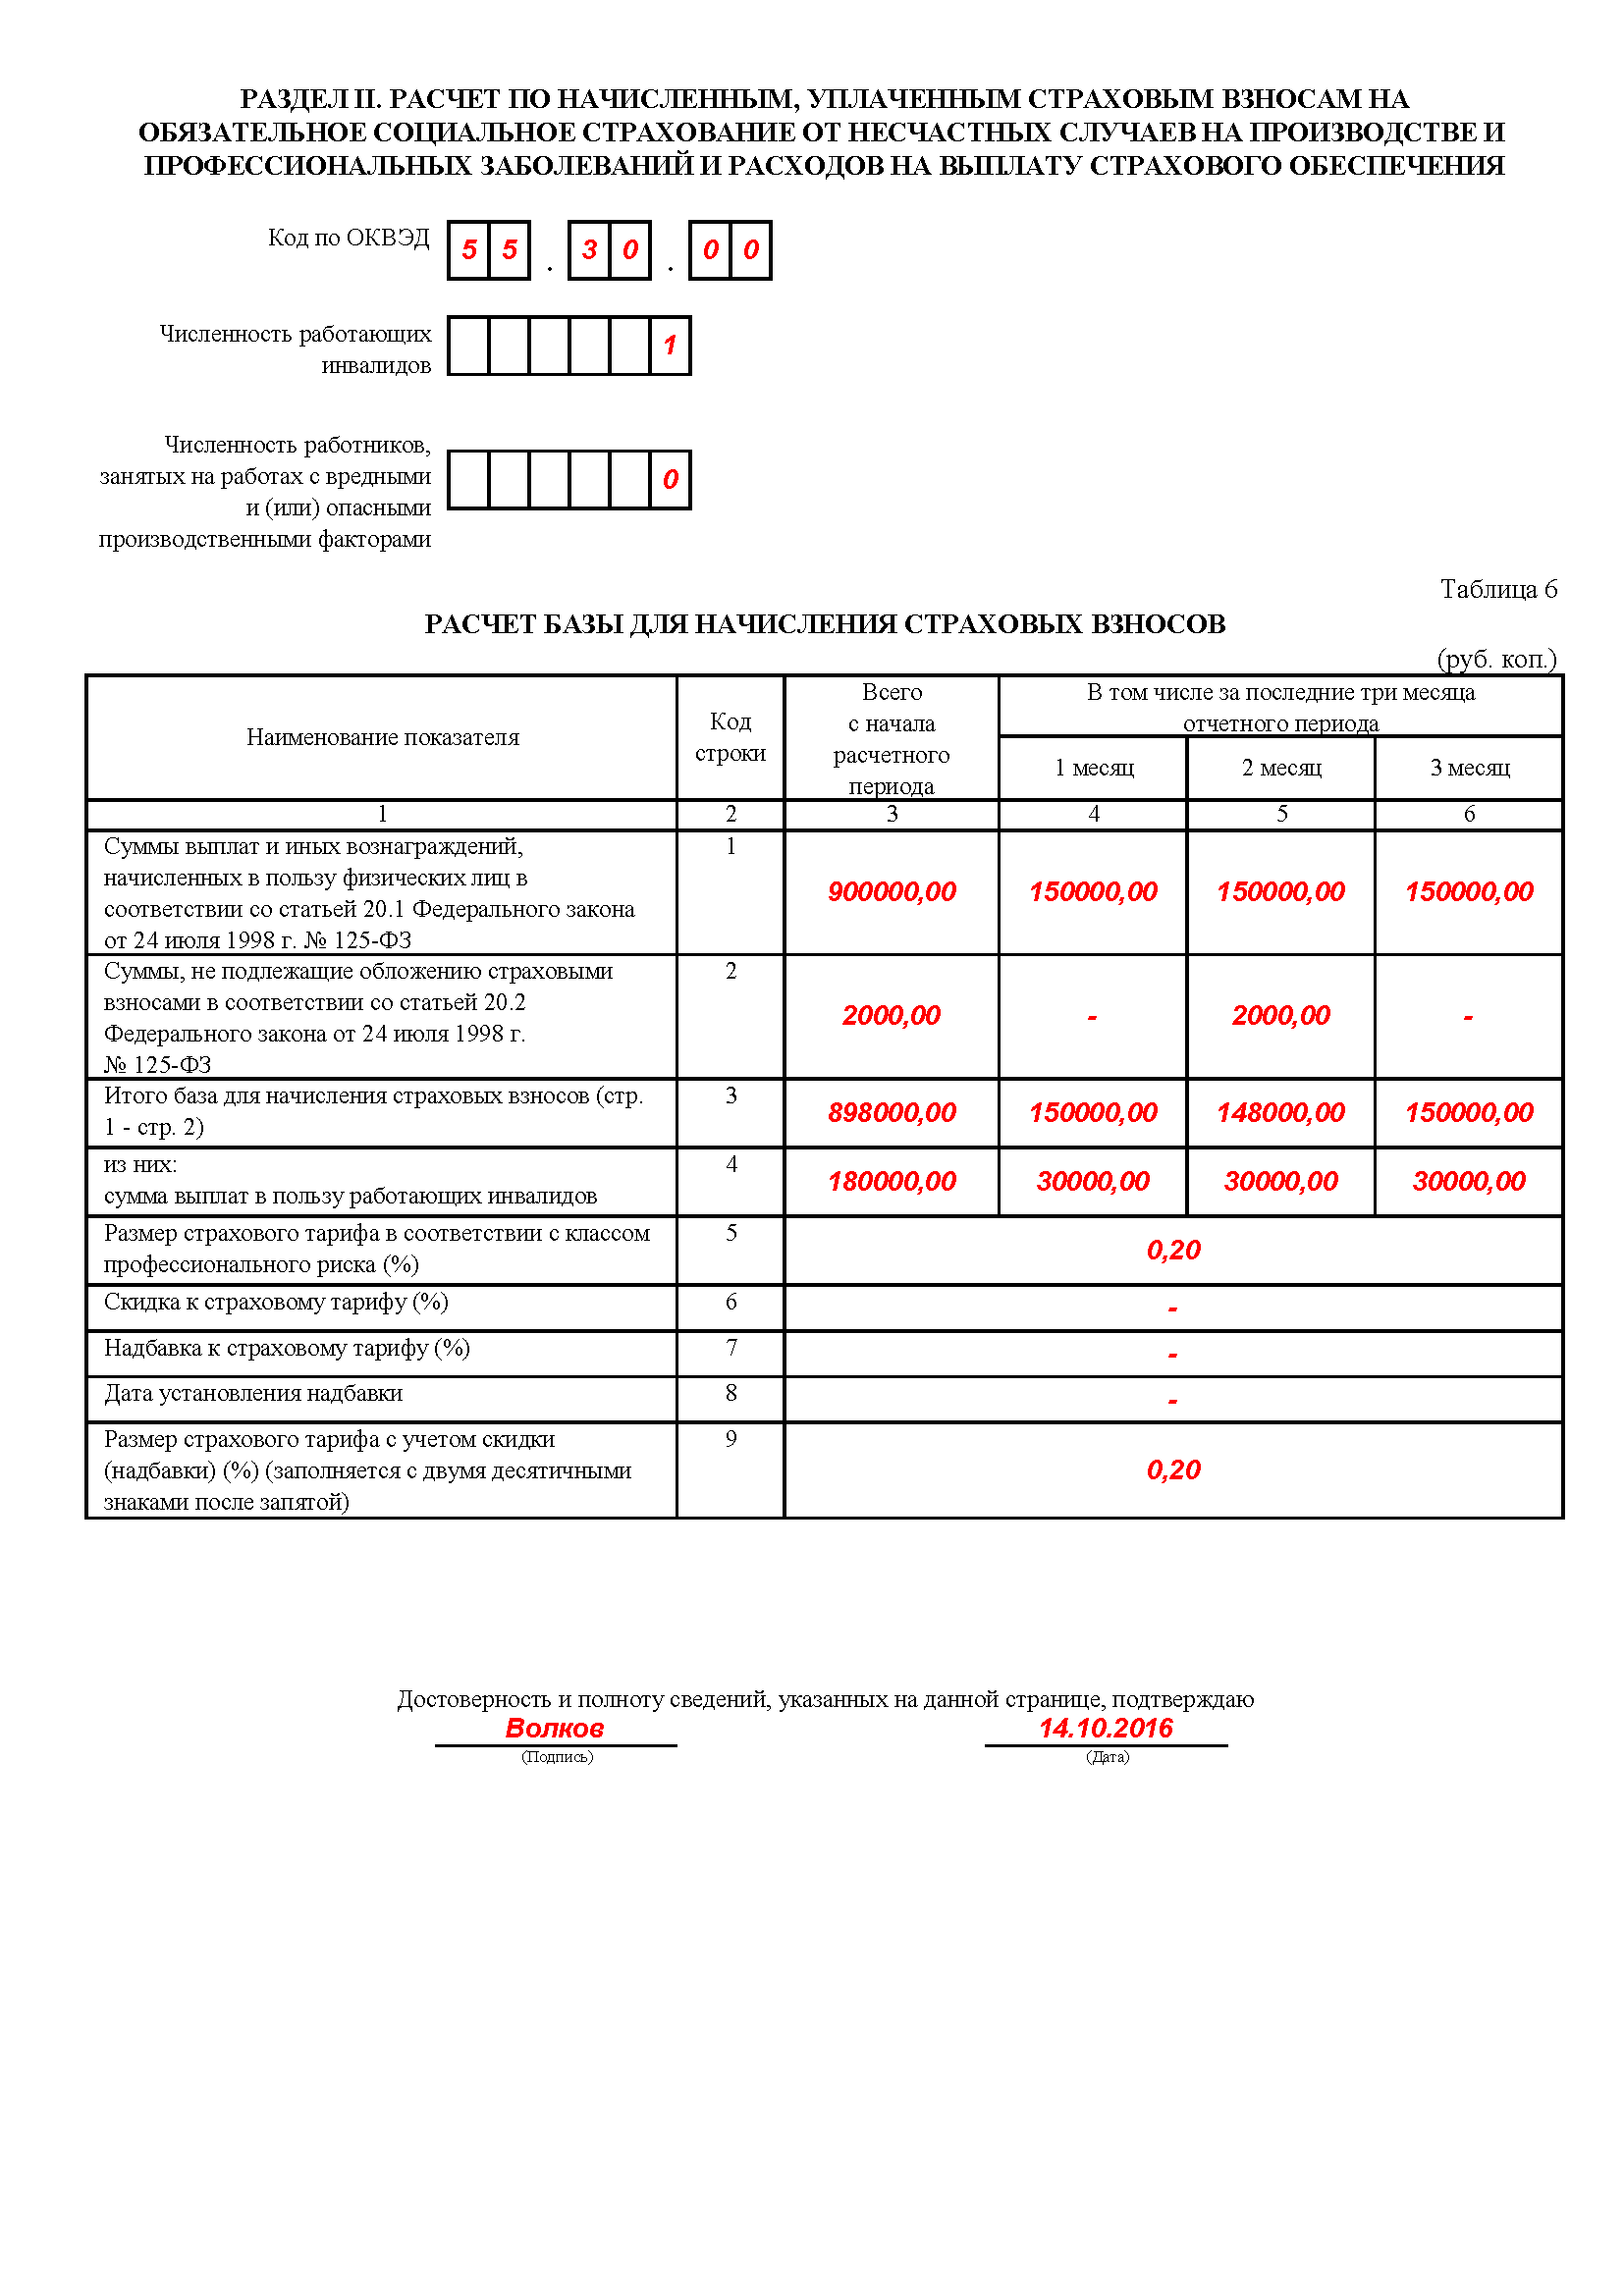 приказ фсс 59 от 26.02 2015 бланк